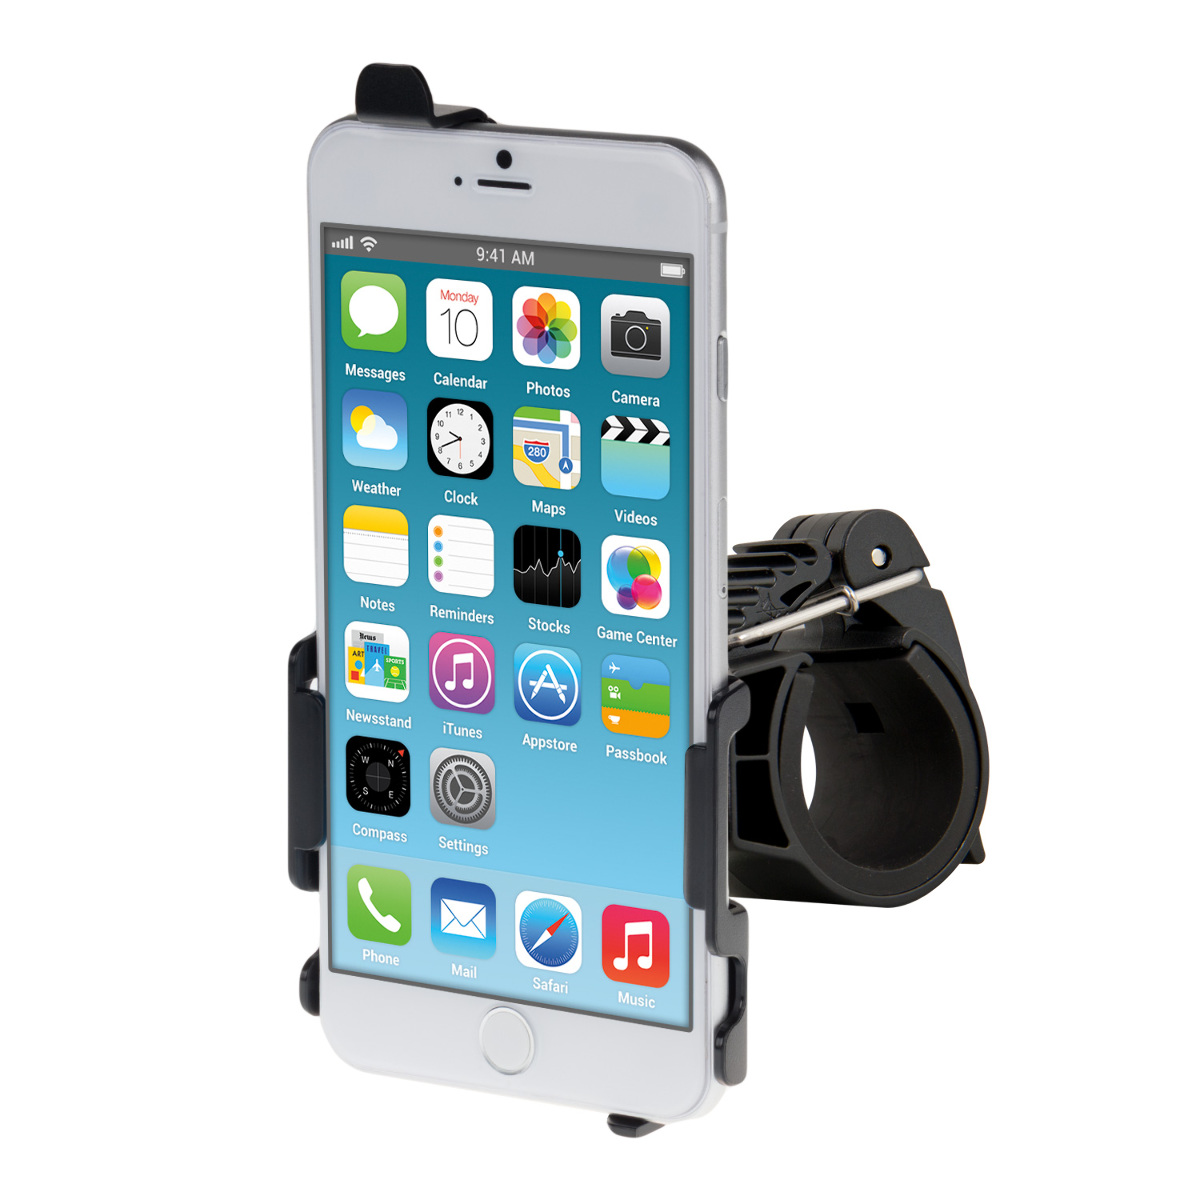 fahrrad halterung apple iphone 6 plus in kreuzlingen. Black Bedroom Furniture Sets. Home Design Ideas